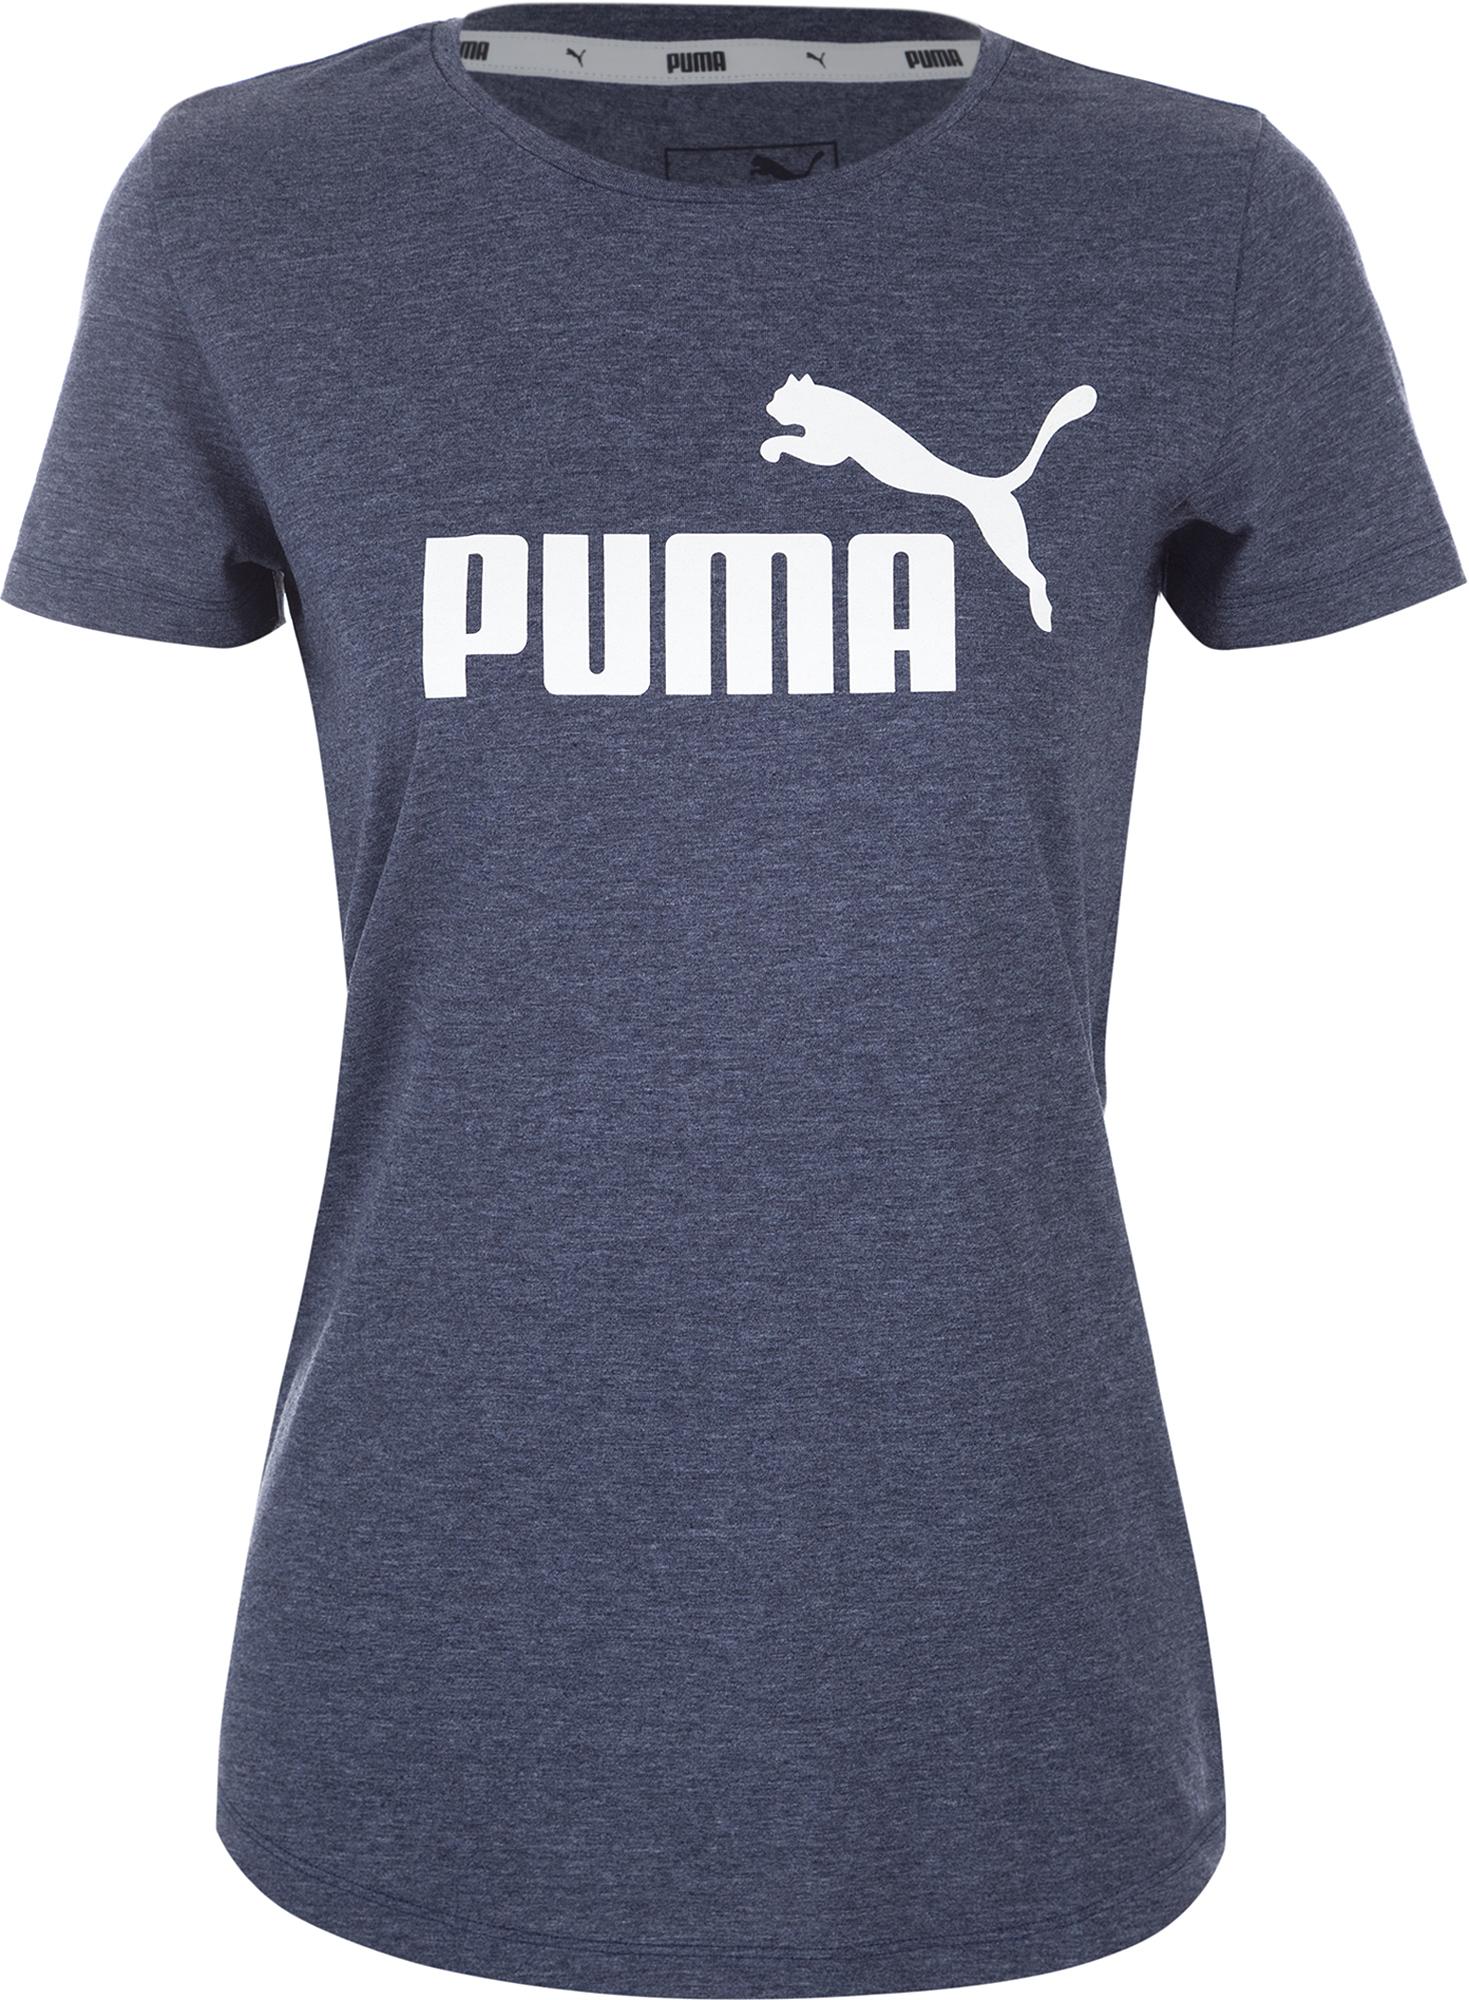 Puma Футболка женская Puma Ess+ Logo Heather Tee, размер 46-48 цена и фото